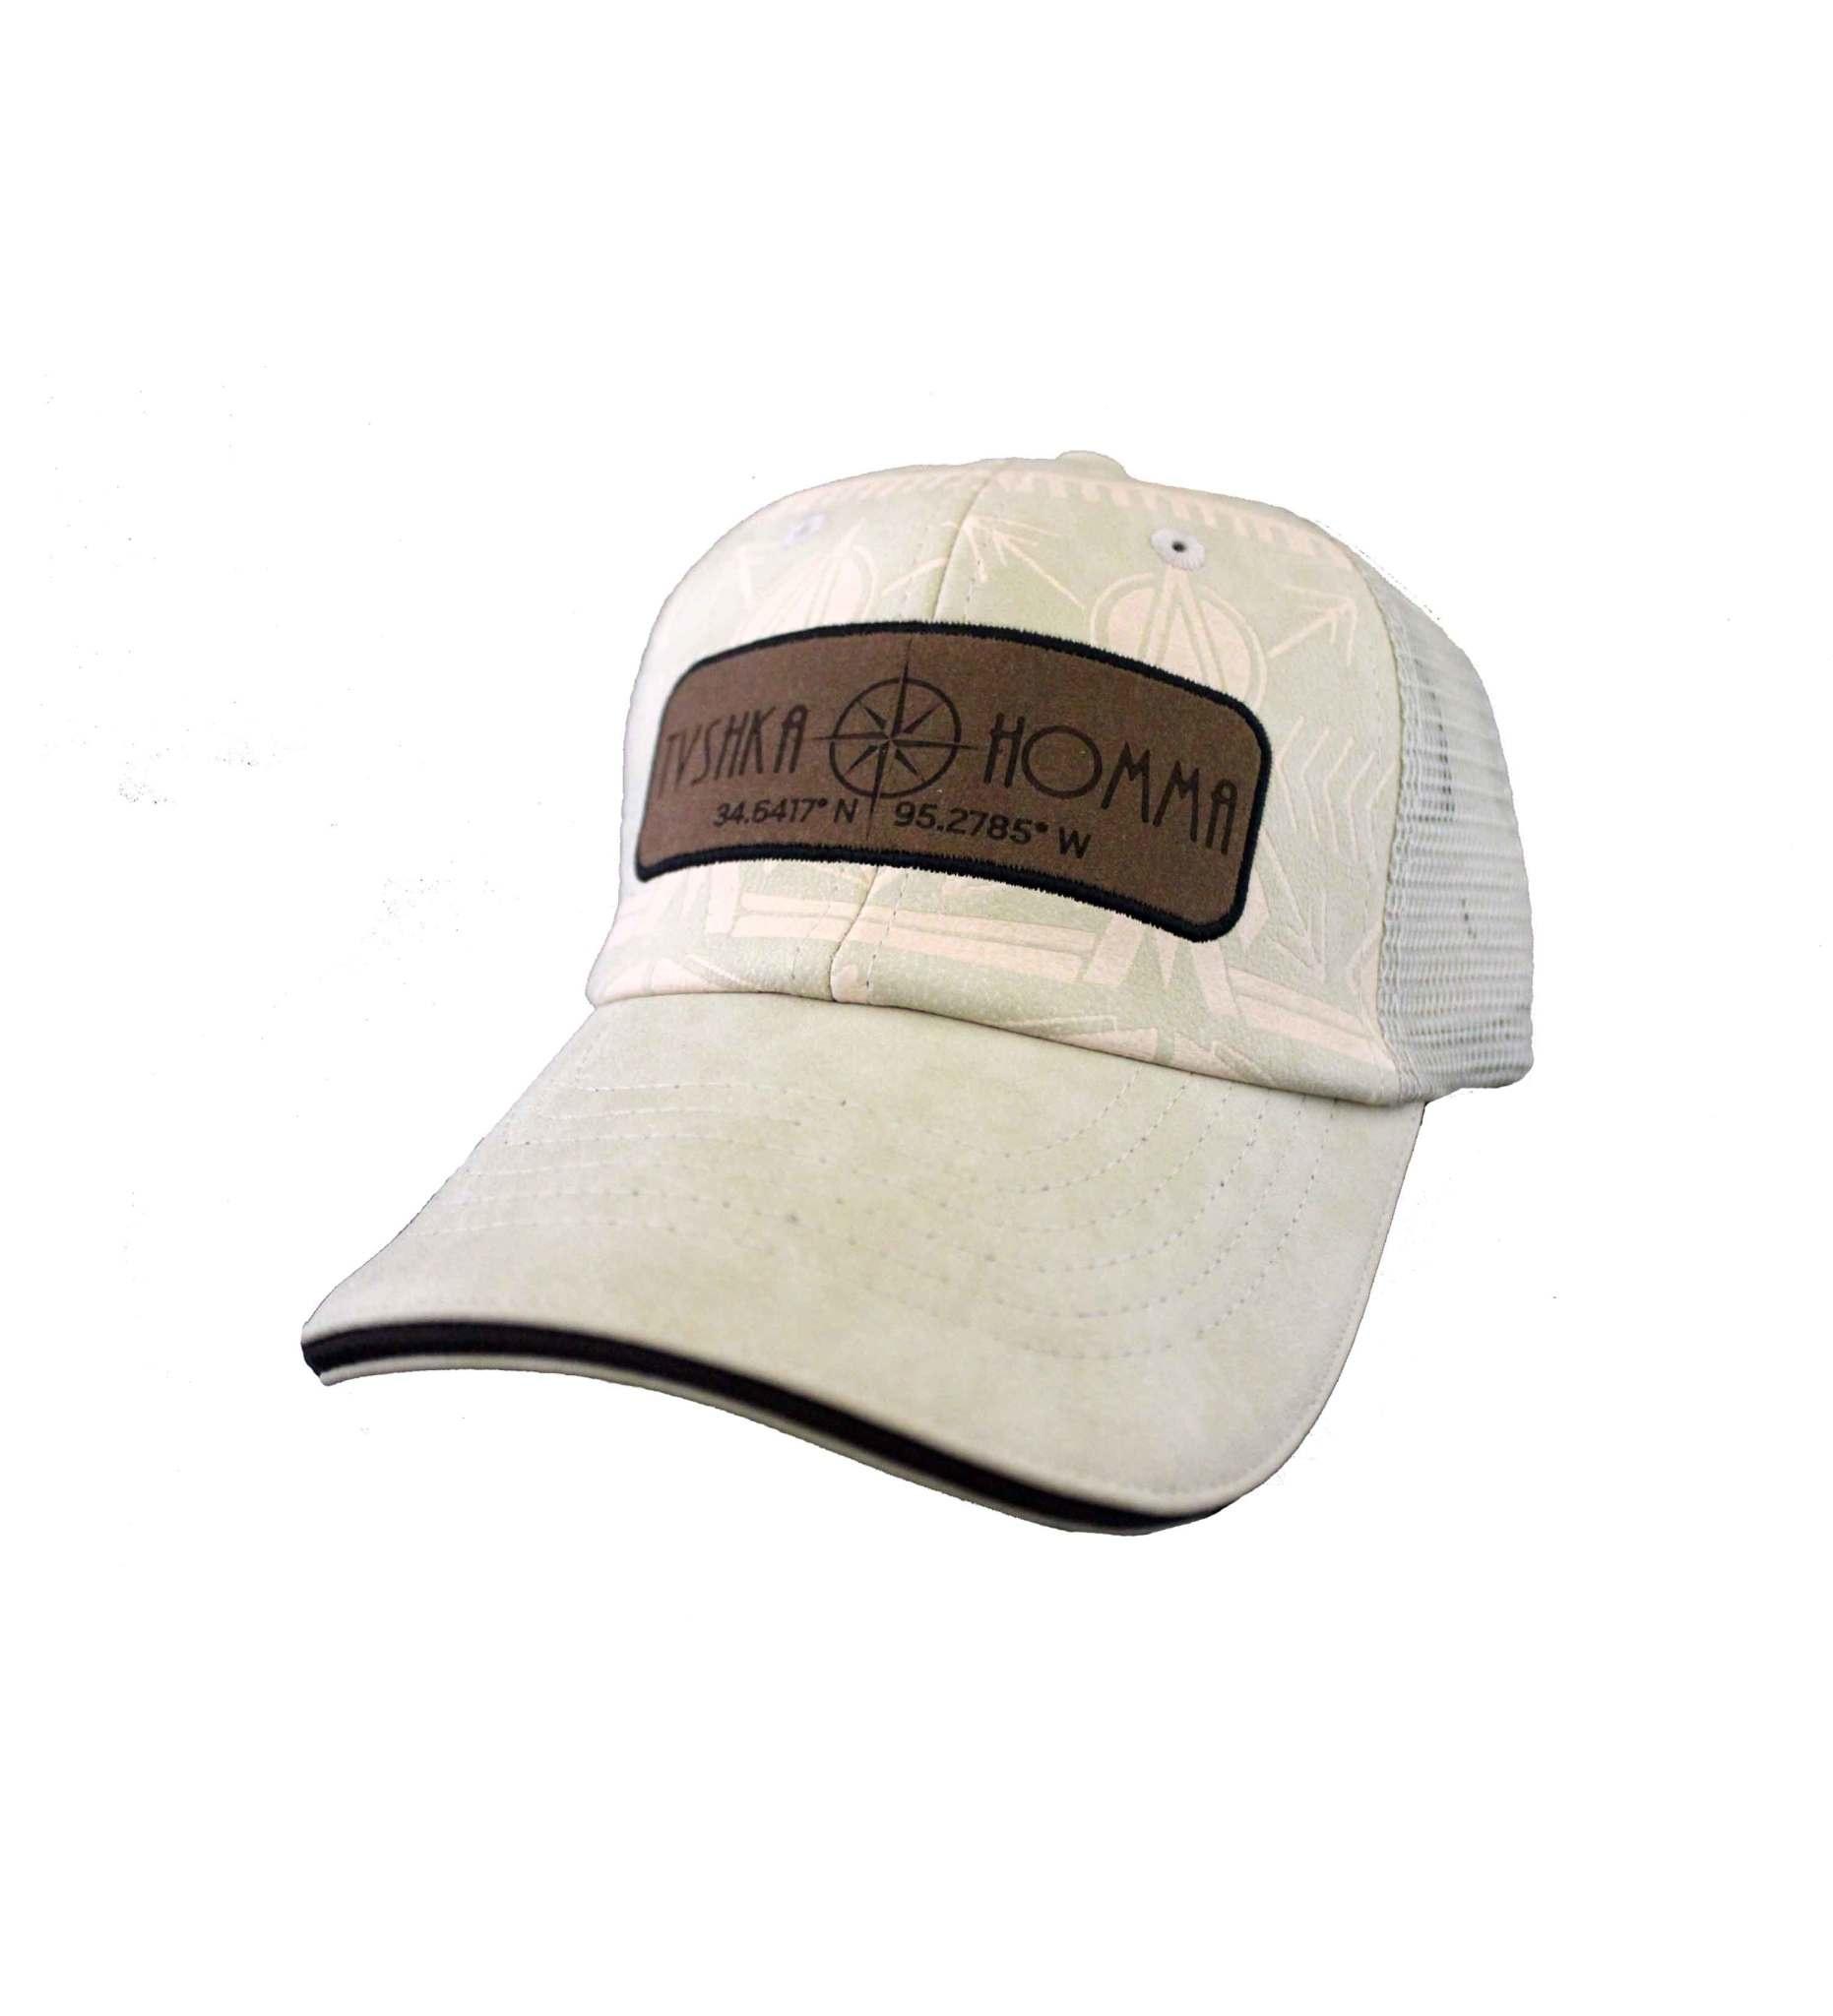 MX195 CAP - Etched Leather Mesh Back Khaki